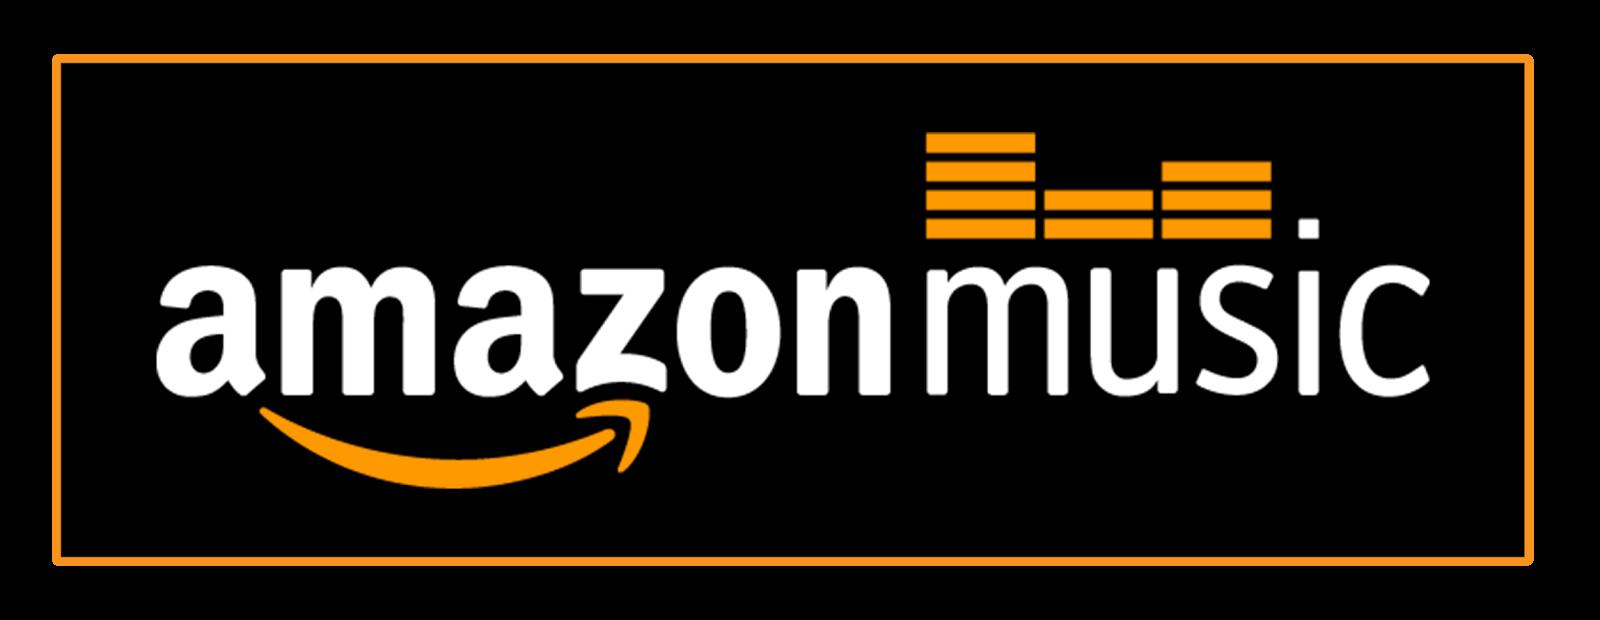 Image Result For Amazon Music Logo Music Logo Logos Tech Company Logos